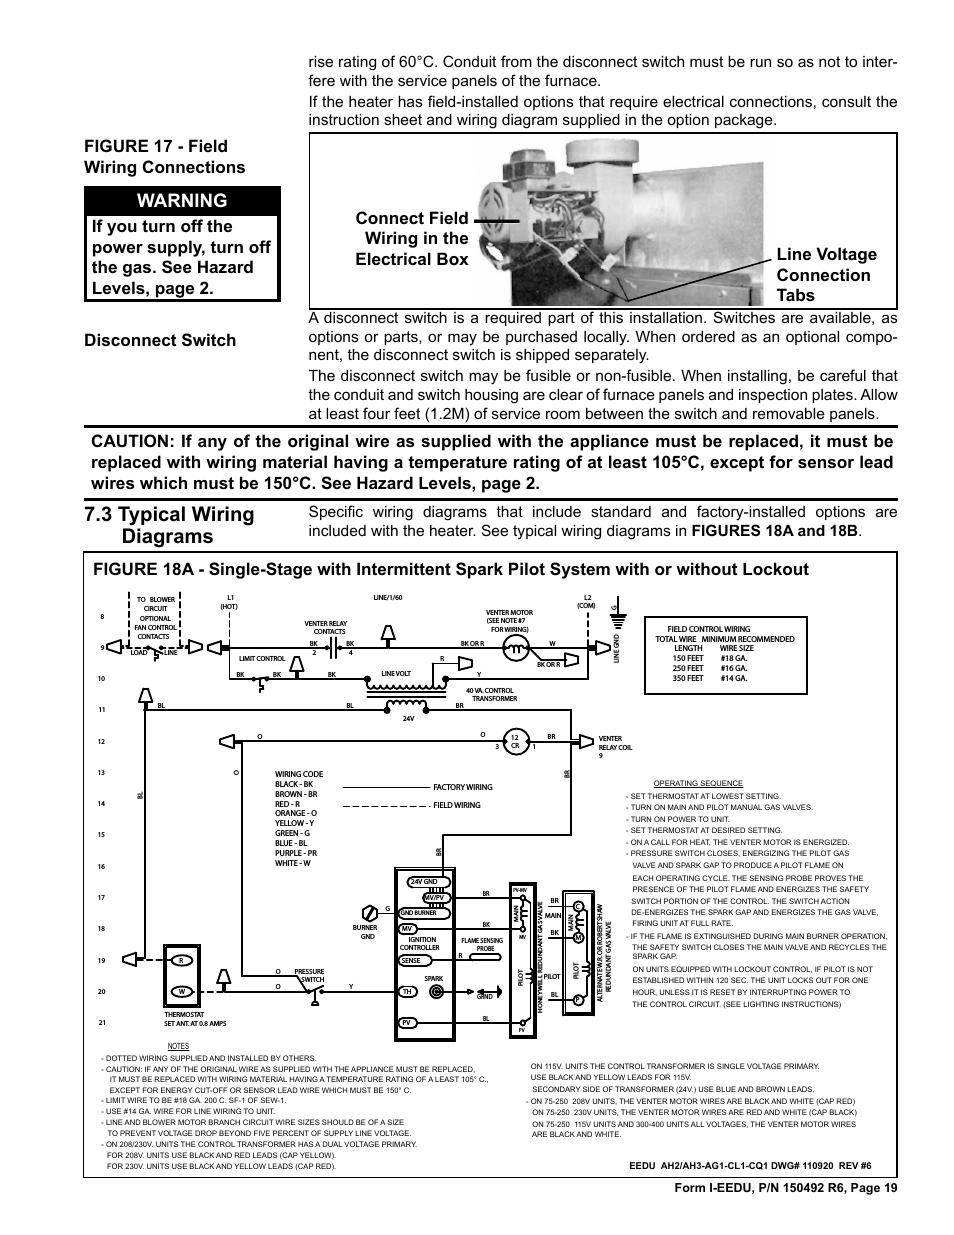 Reznor Heater Wiring Diagram | Manual E-Books - Reznor Heater Wiring Diagram